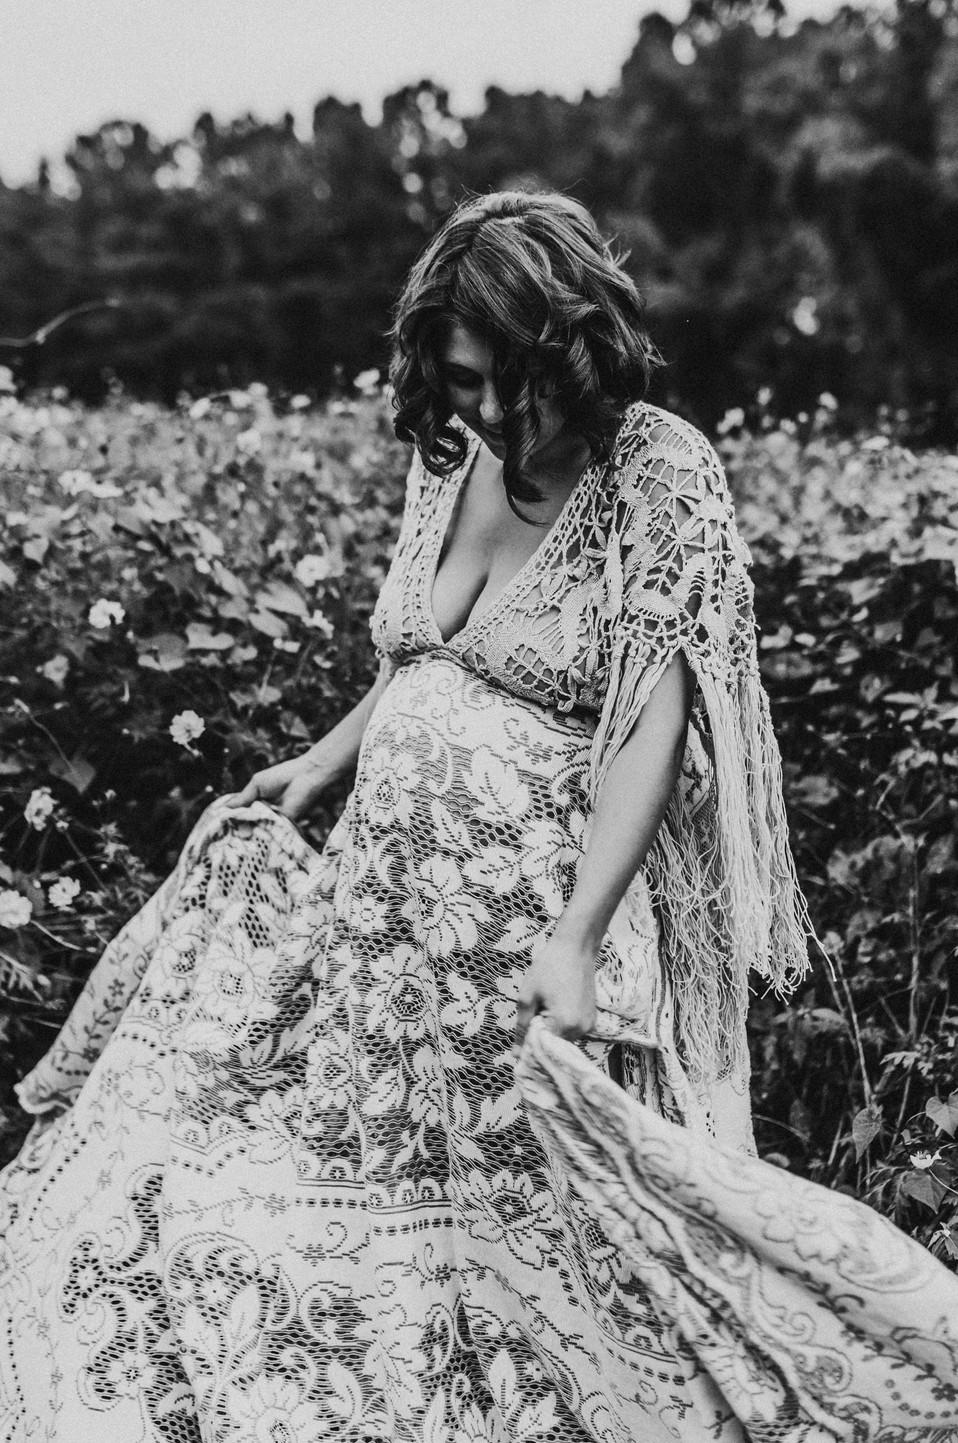 Aim True Photography, North Carolina Photographer, North Carolina Wedding Photography, Raleigh, Durham, Fayetteville, Couples, Reclamation Dress